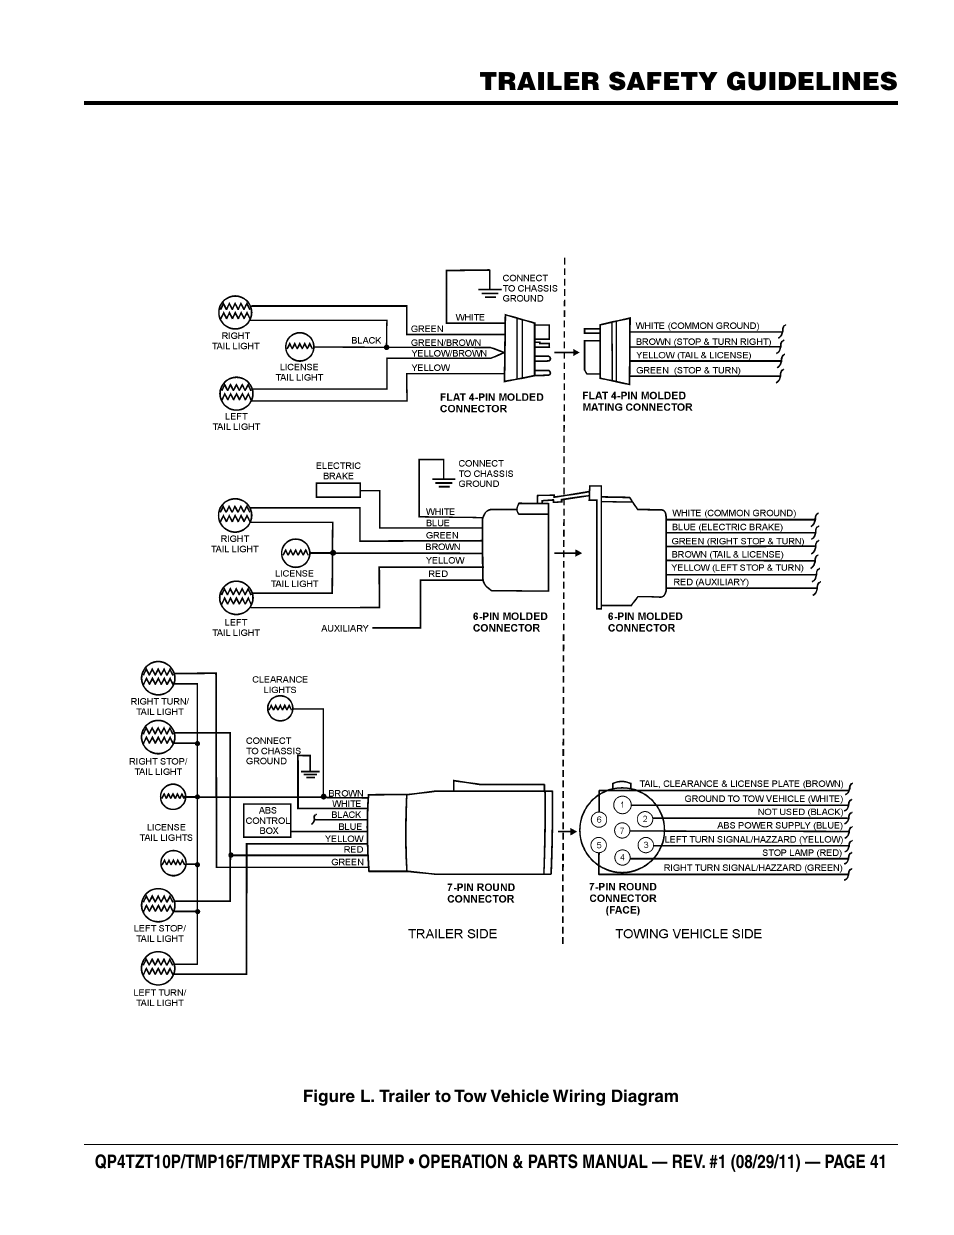 Trailer safety guidelines | Multiquip TRASH PUMP (hatz 1B40u-2203a diesel  engine) Qp4tZt10p User Manual | Page 41 / 118